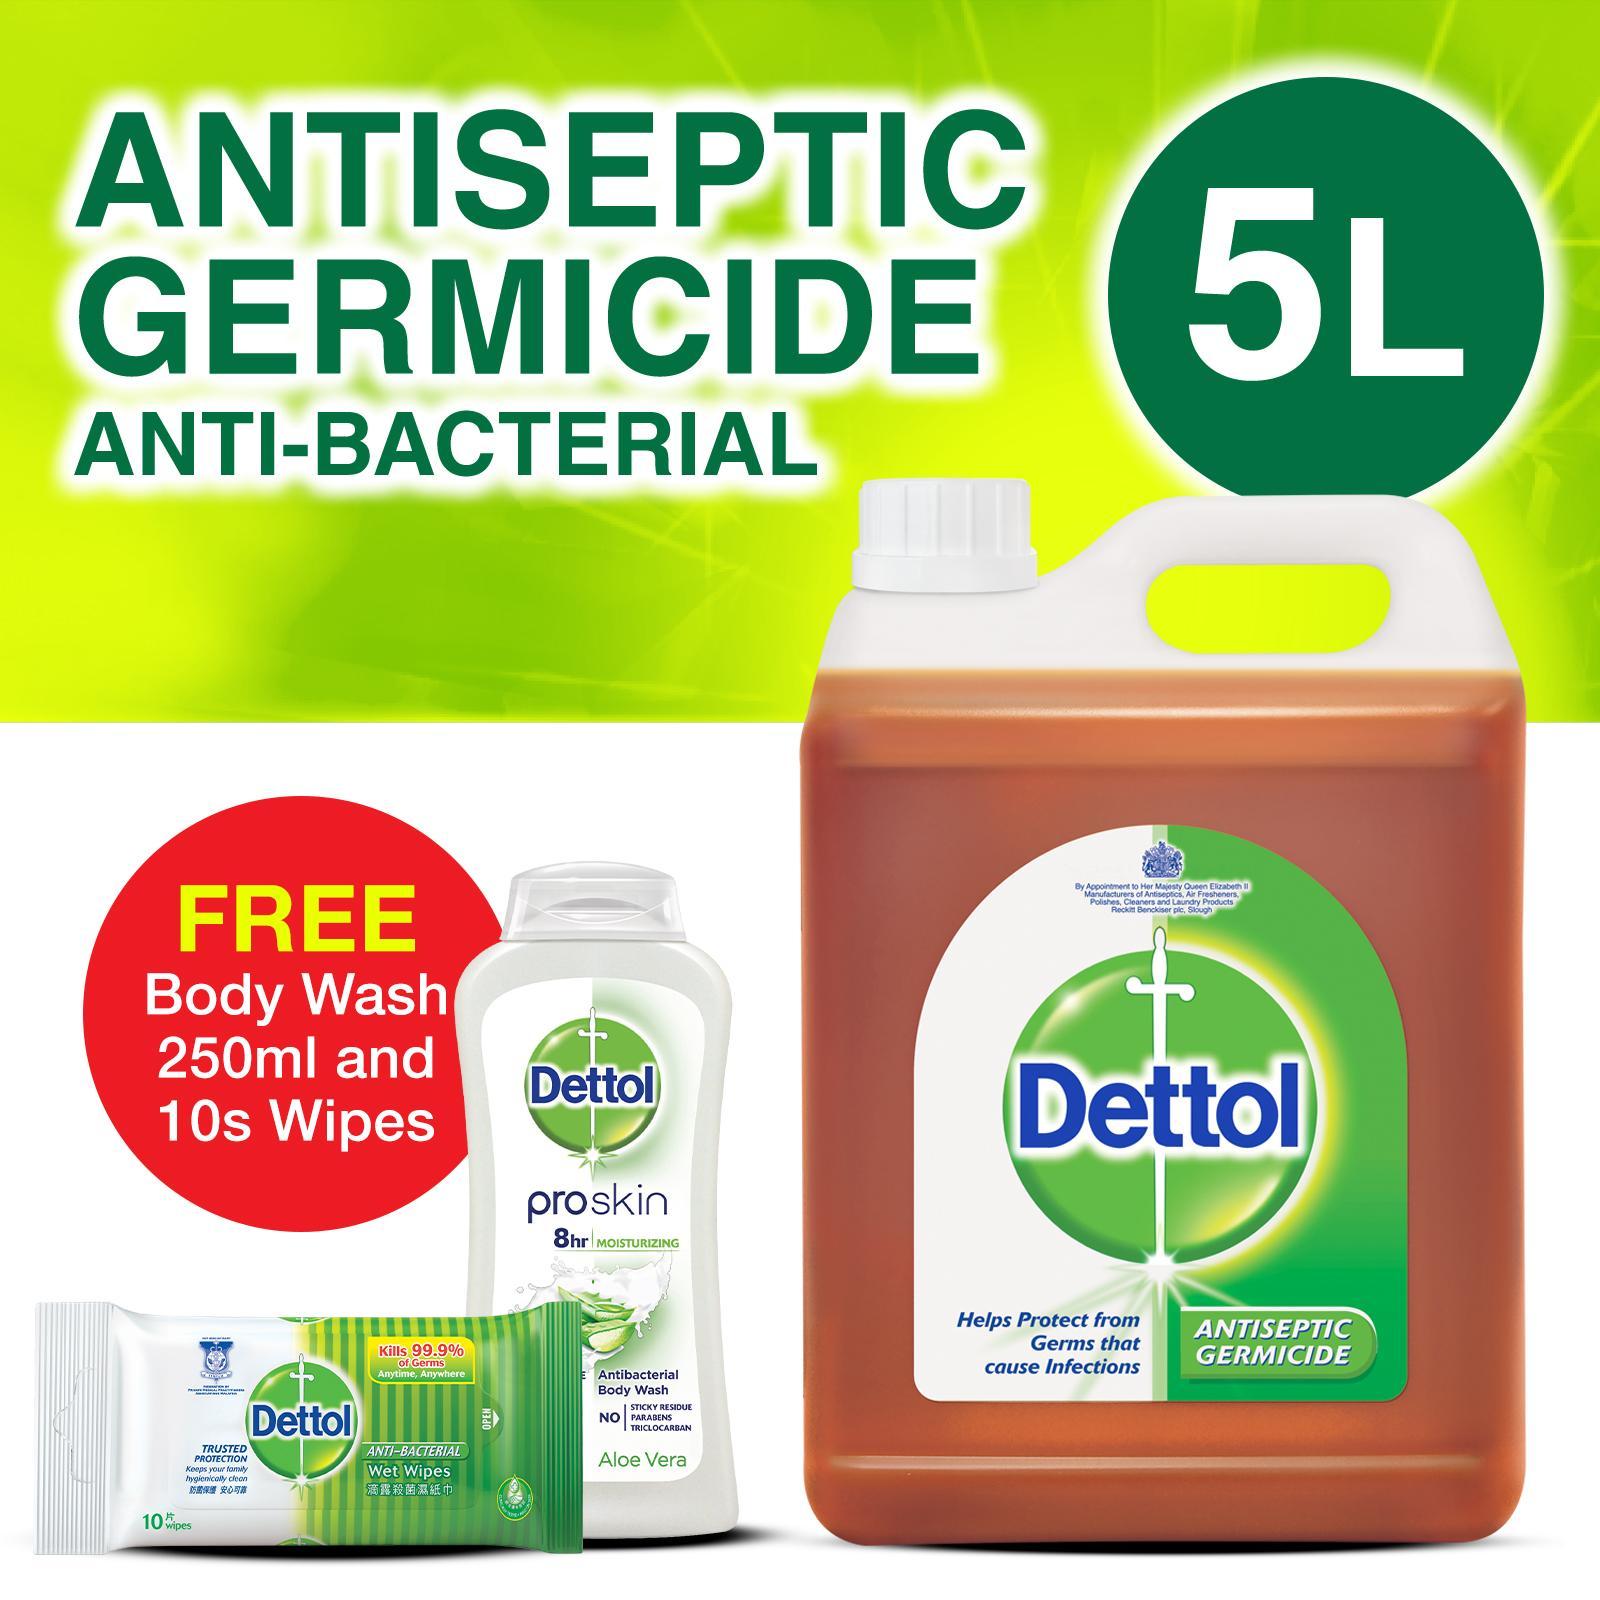 Dettol Antiseptic Liquid 5l + Free Pro-Skin Aloe Vera Shower Gel 250ml + Free Wet Wipes (10s) By Dettol.